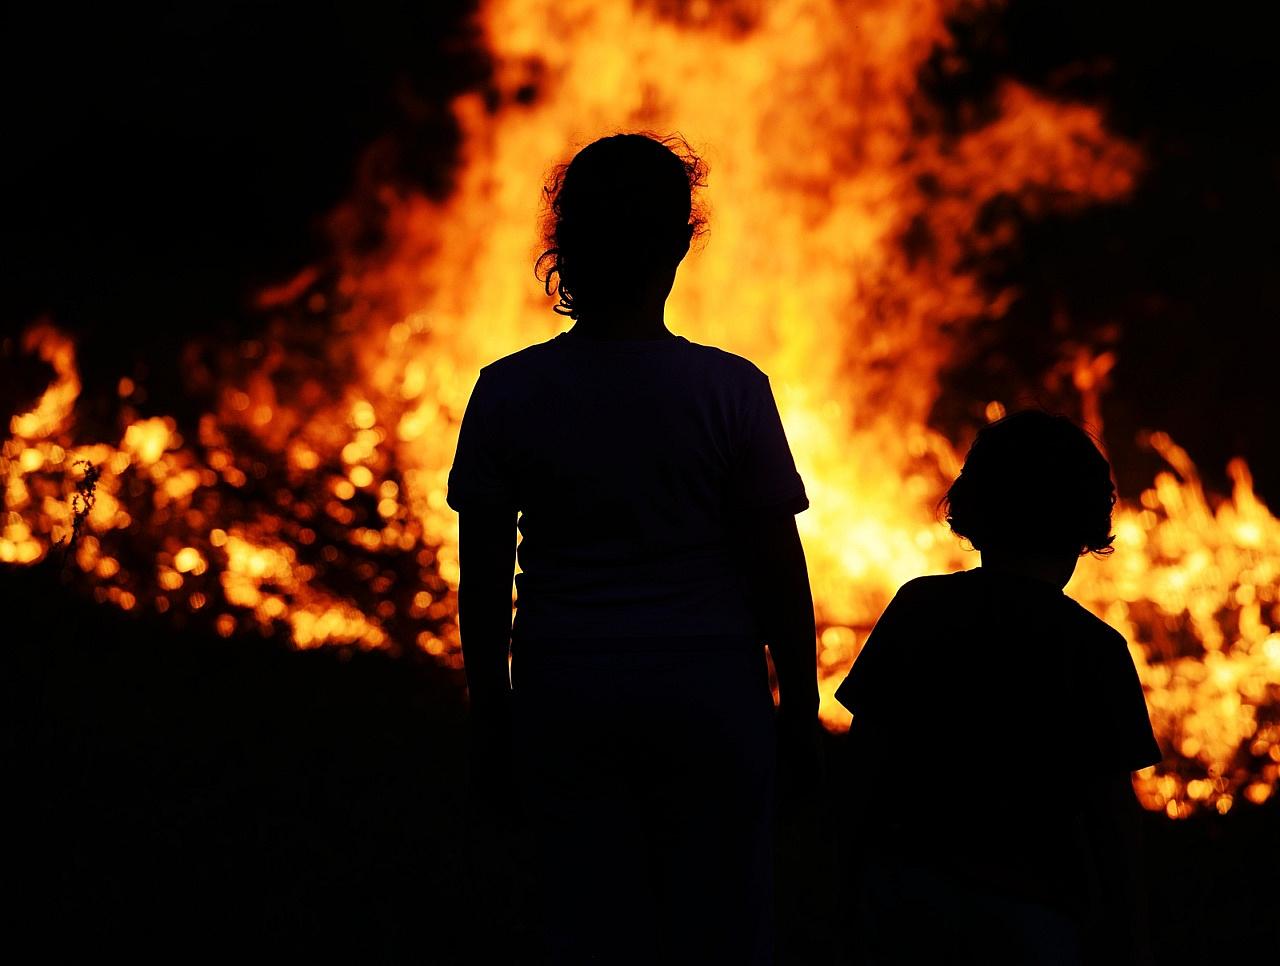 Фото ребенка в пожаре